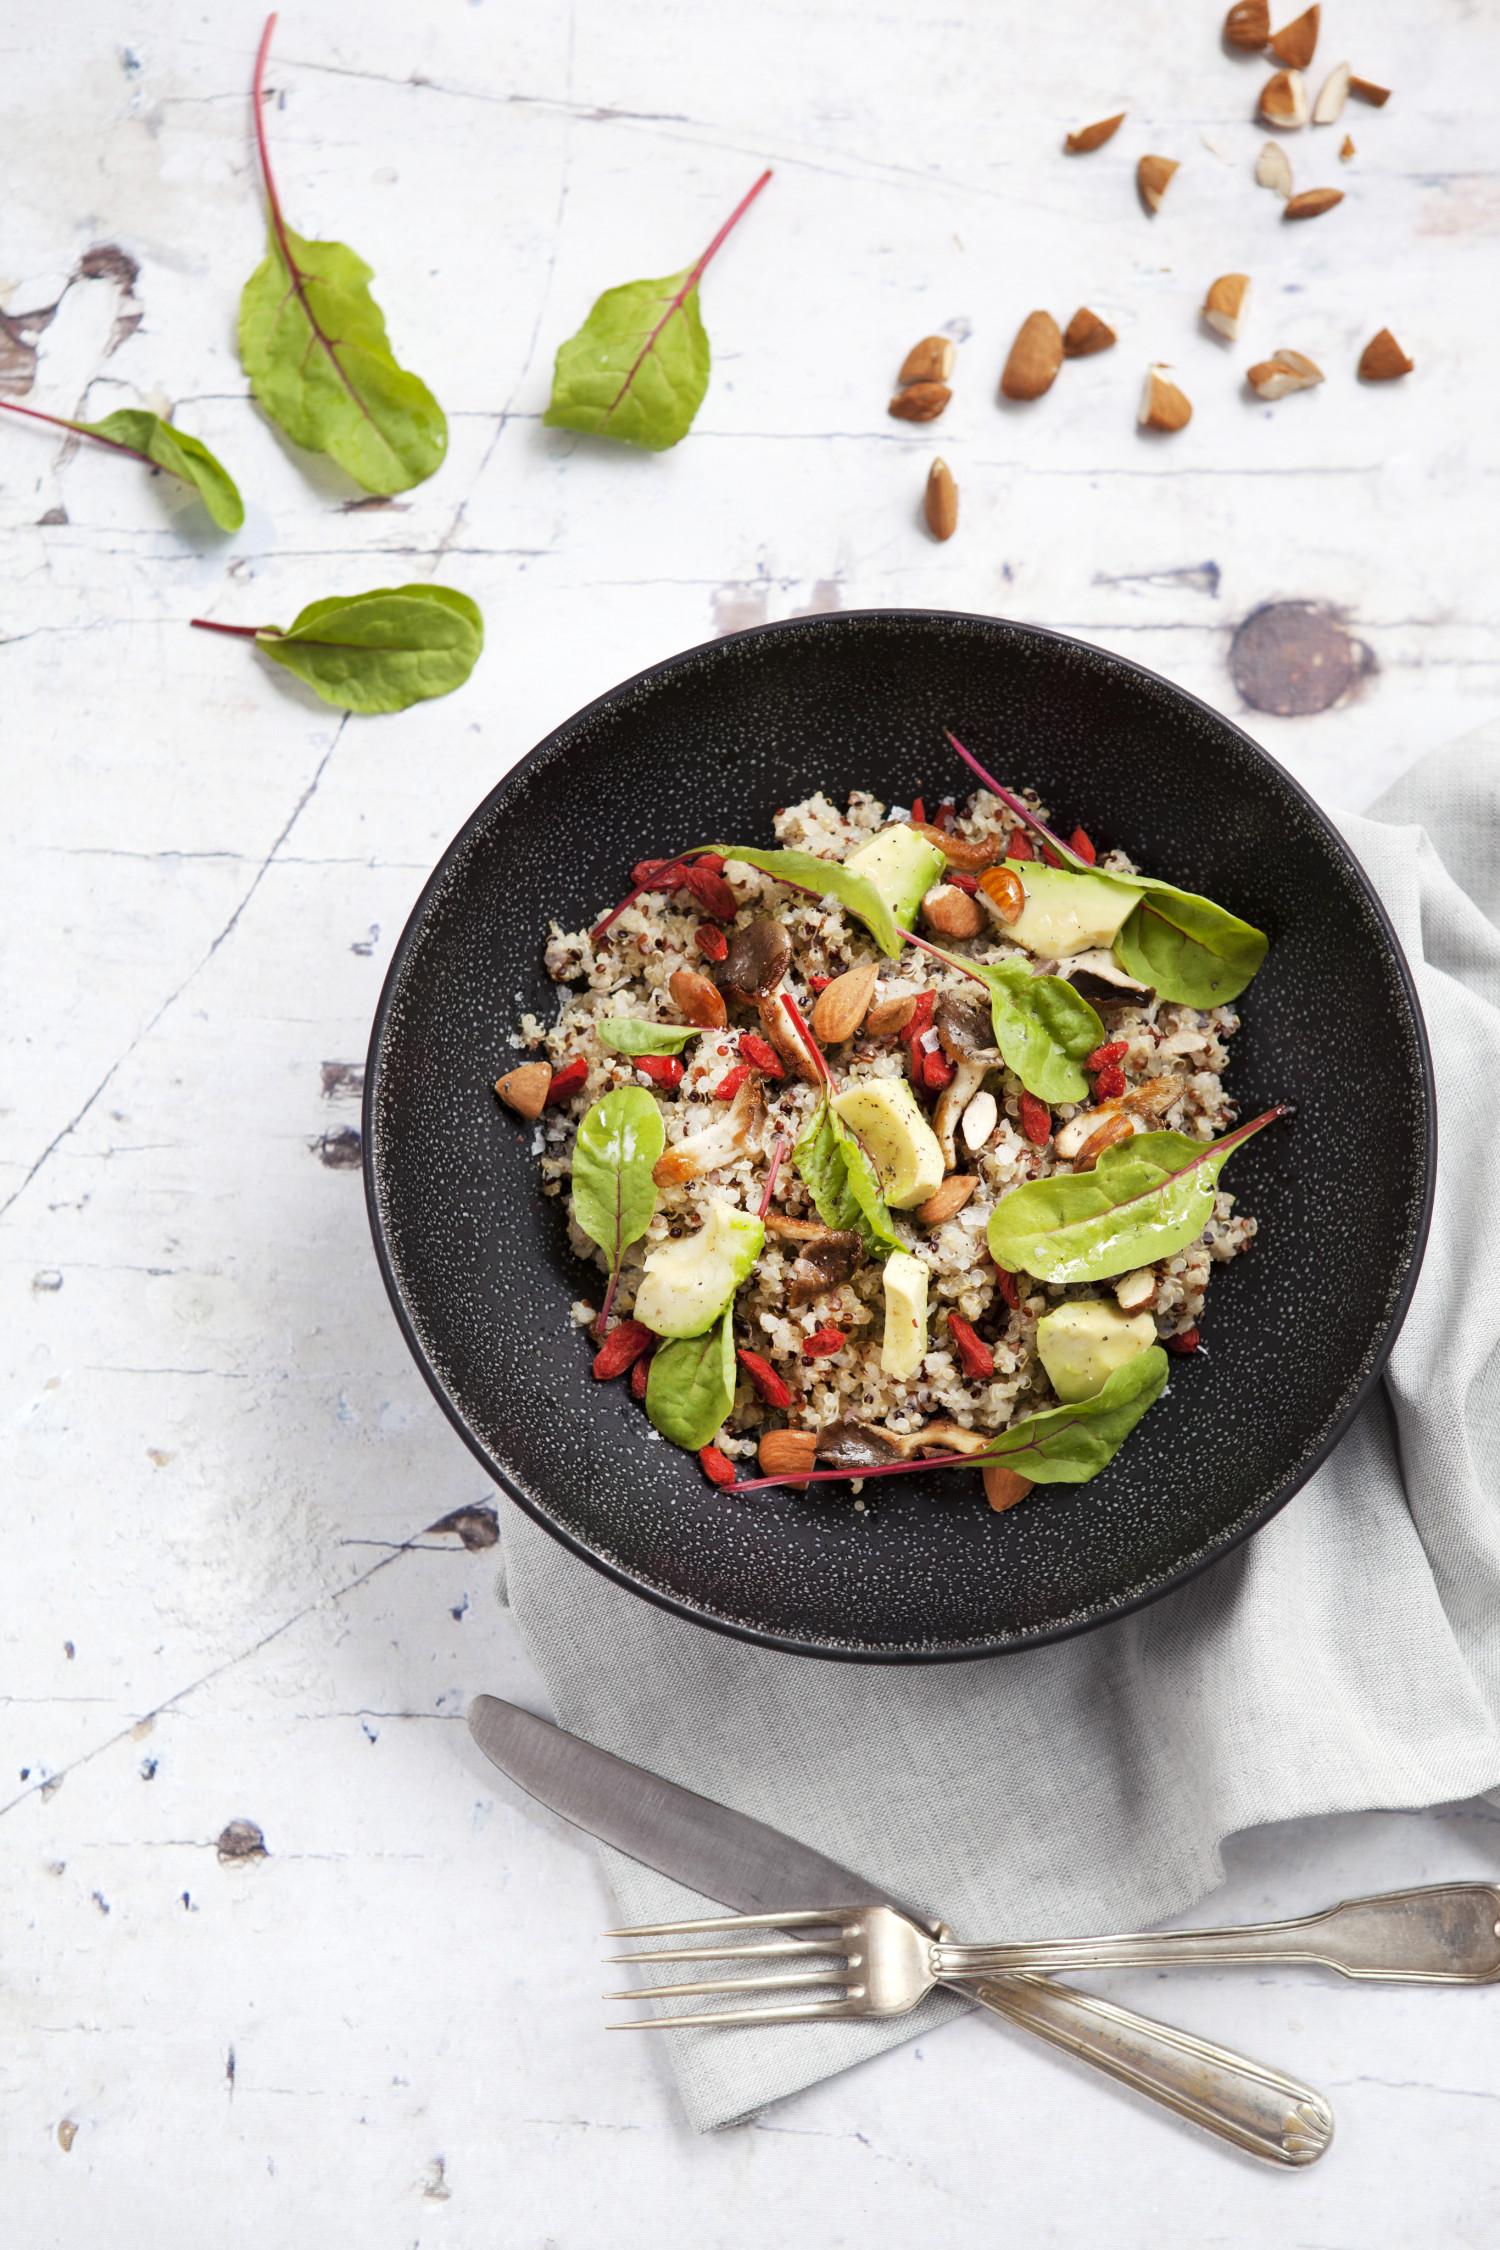 Quinoa Superfood Salad with Shiitake Mushrooms